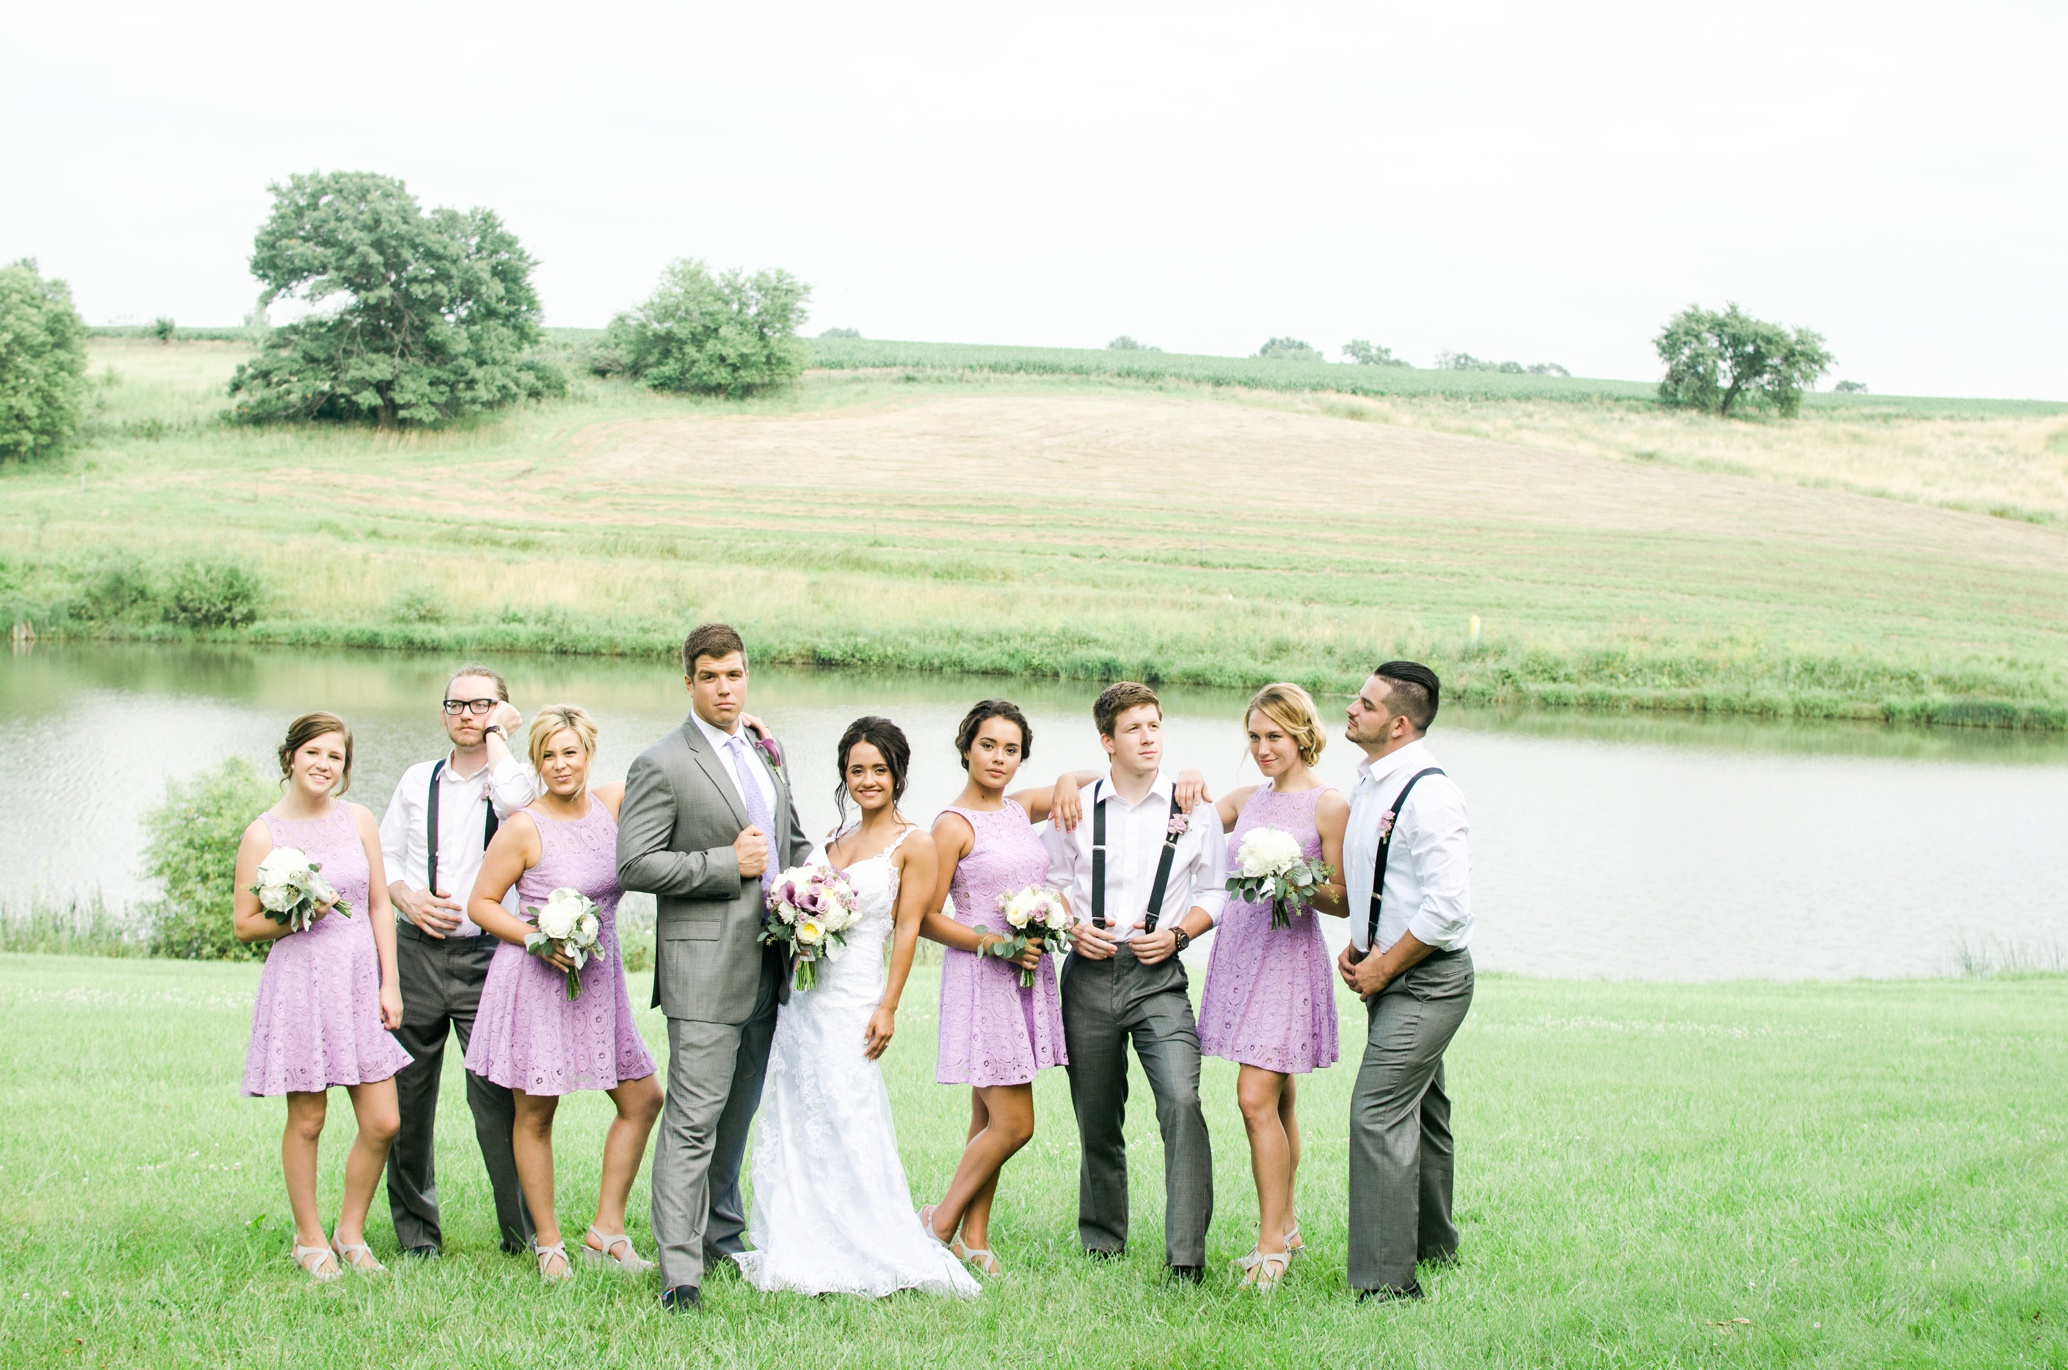 Barnes' Place Rustic Outdoor Wedding | Ali Leigh Photo Minneapolis Wedding Photographer_0141.jpg